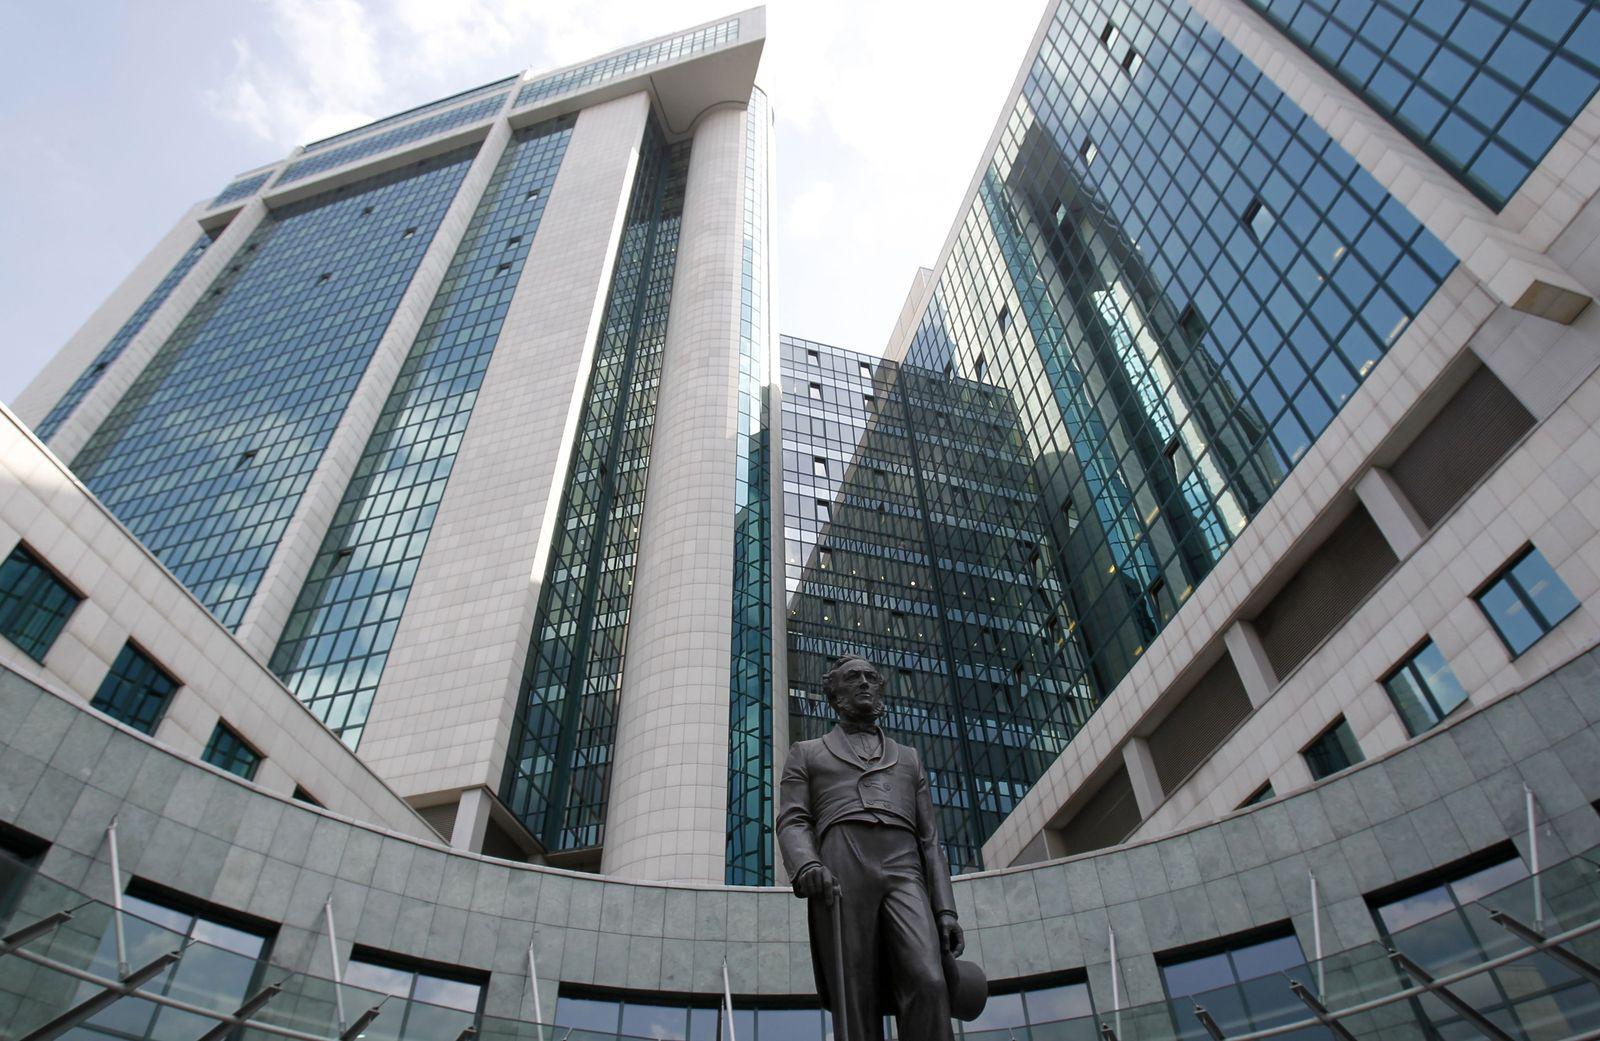 Sberbank / Headquarter / Russland